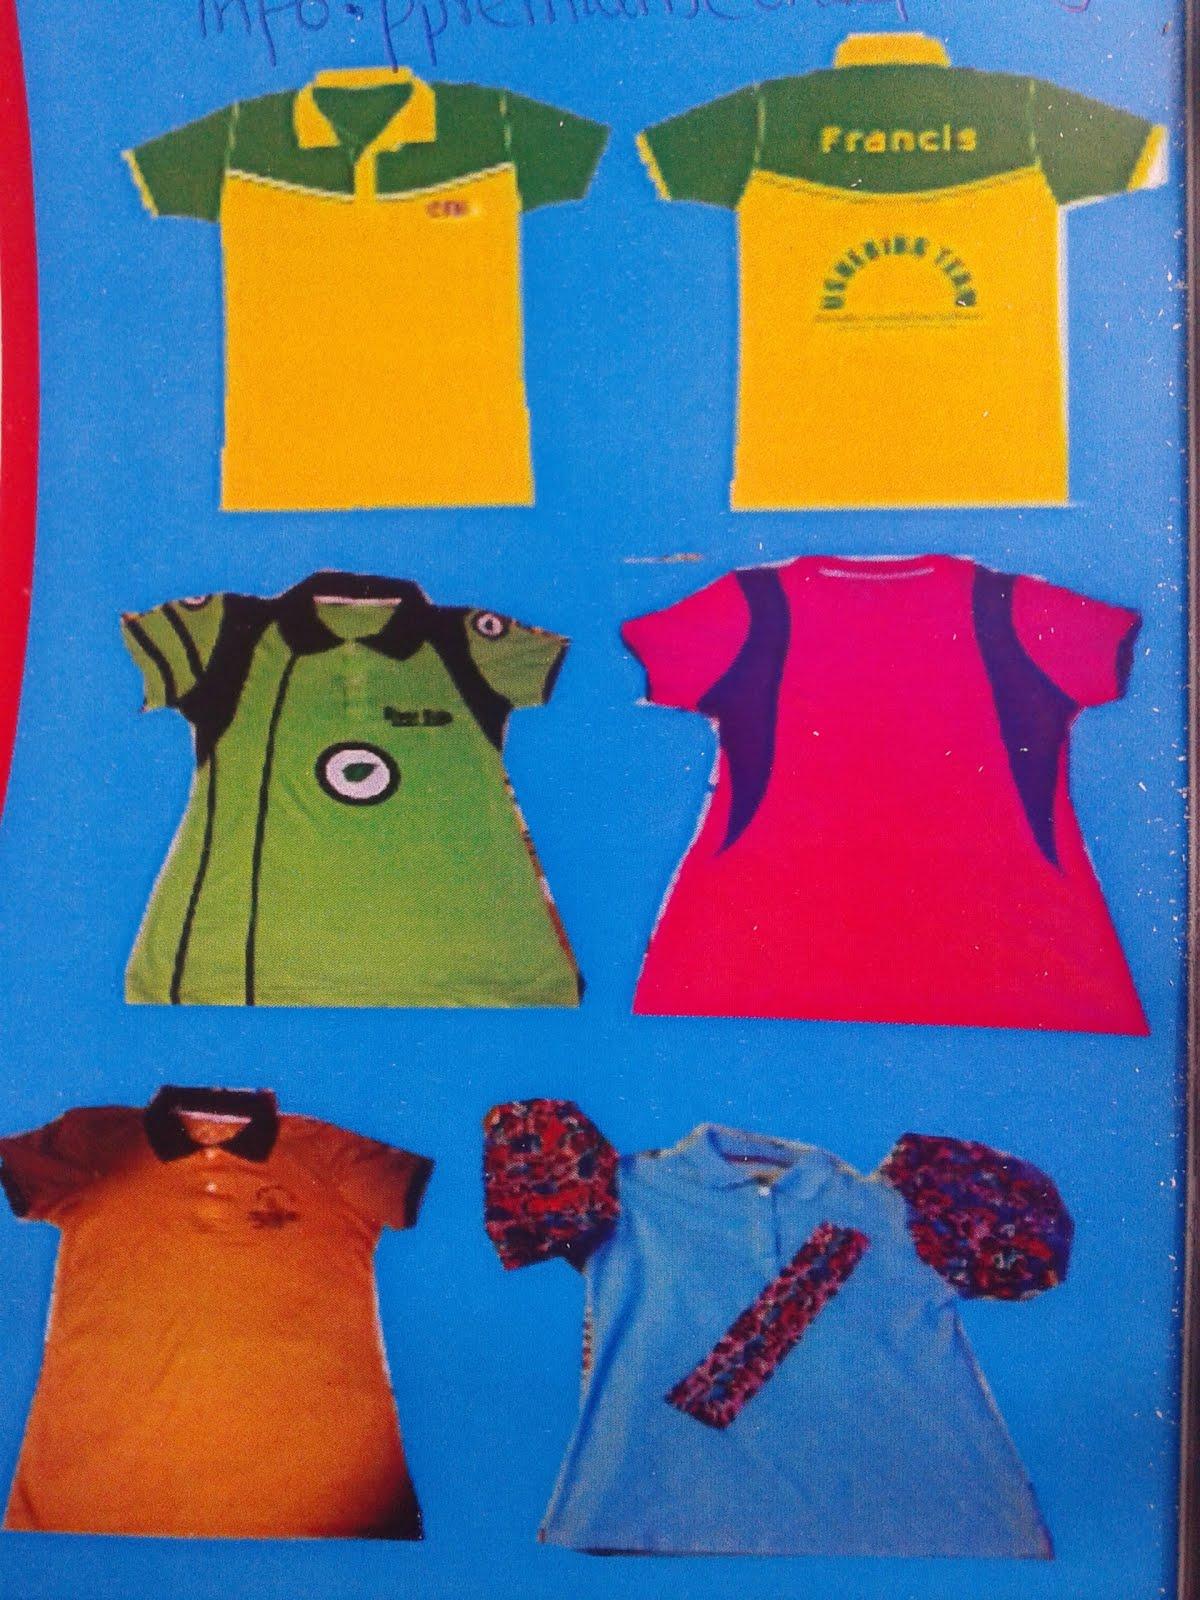 Shirts & Fashion Accessories on fleek!